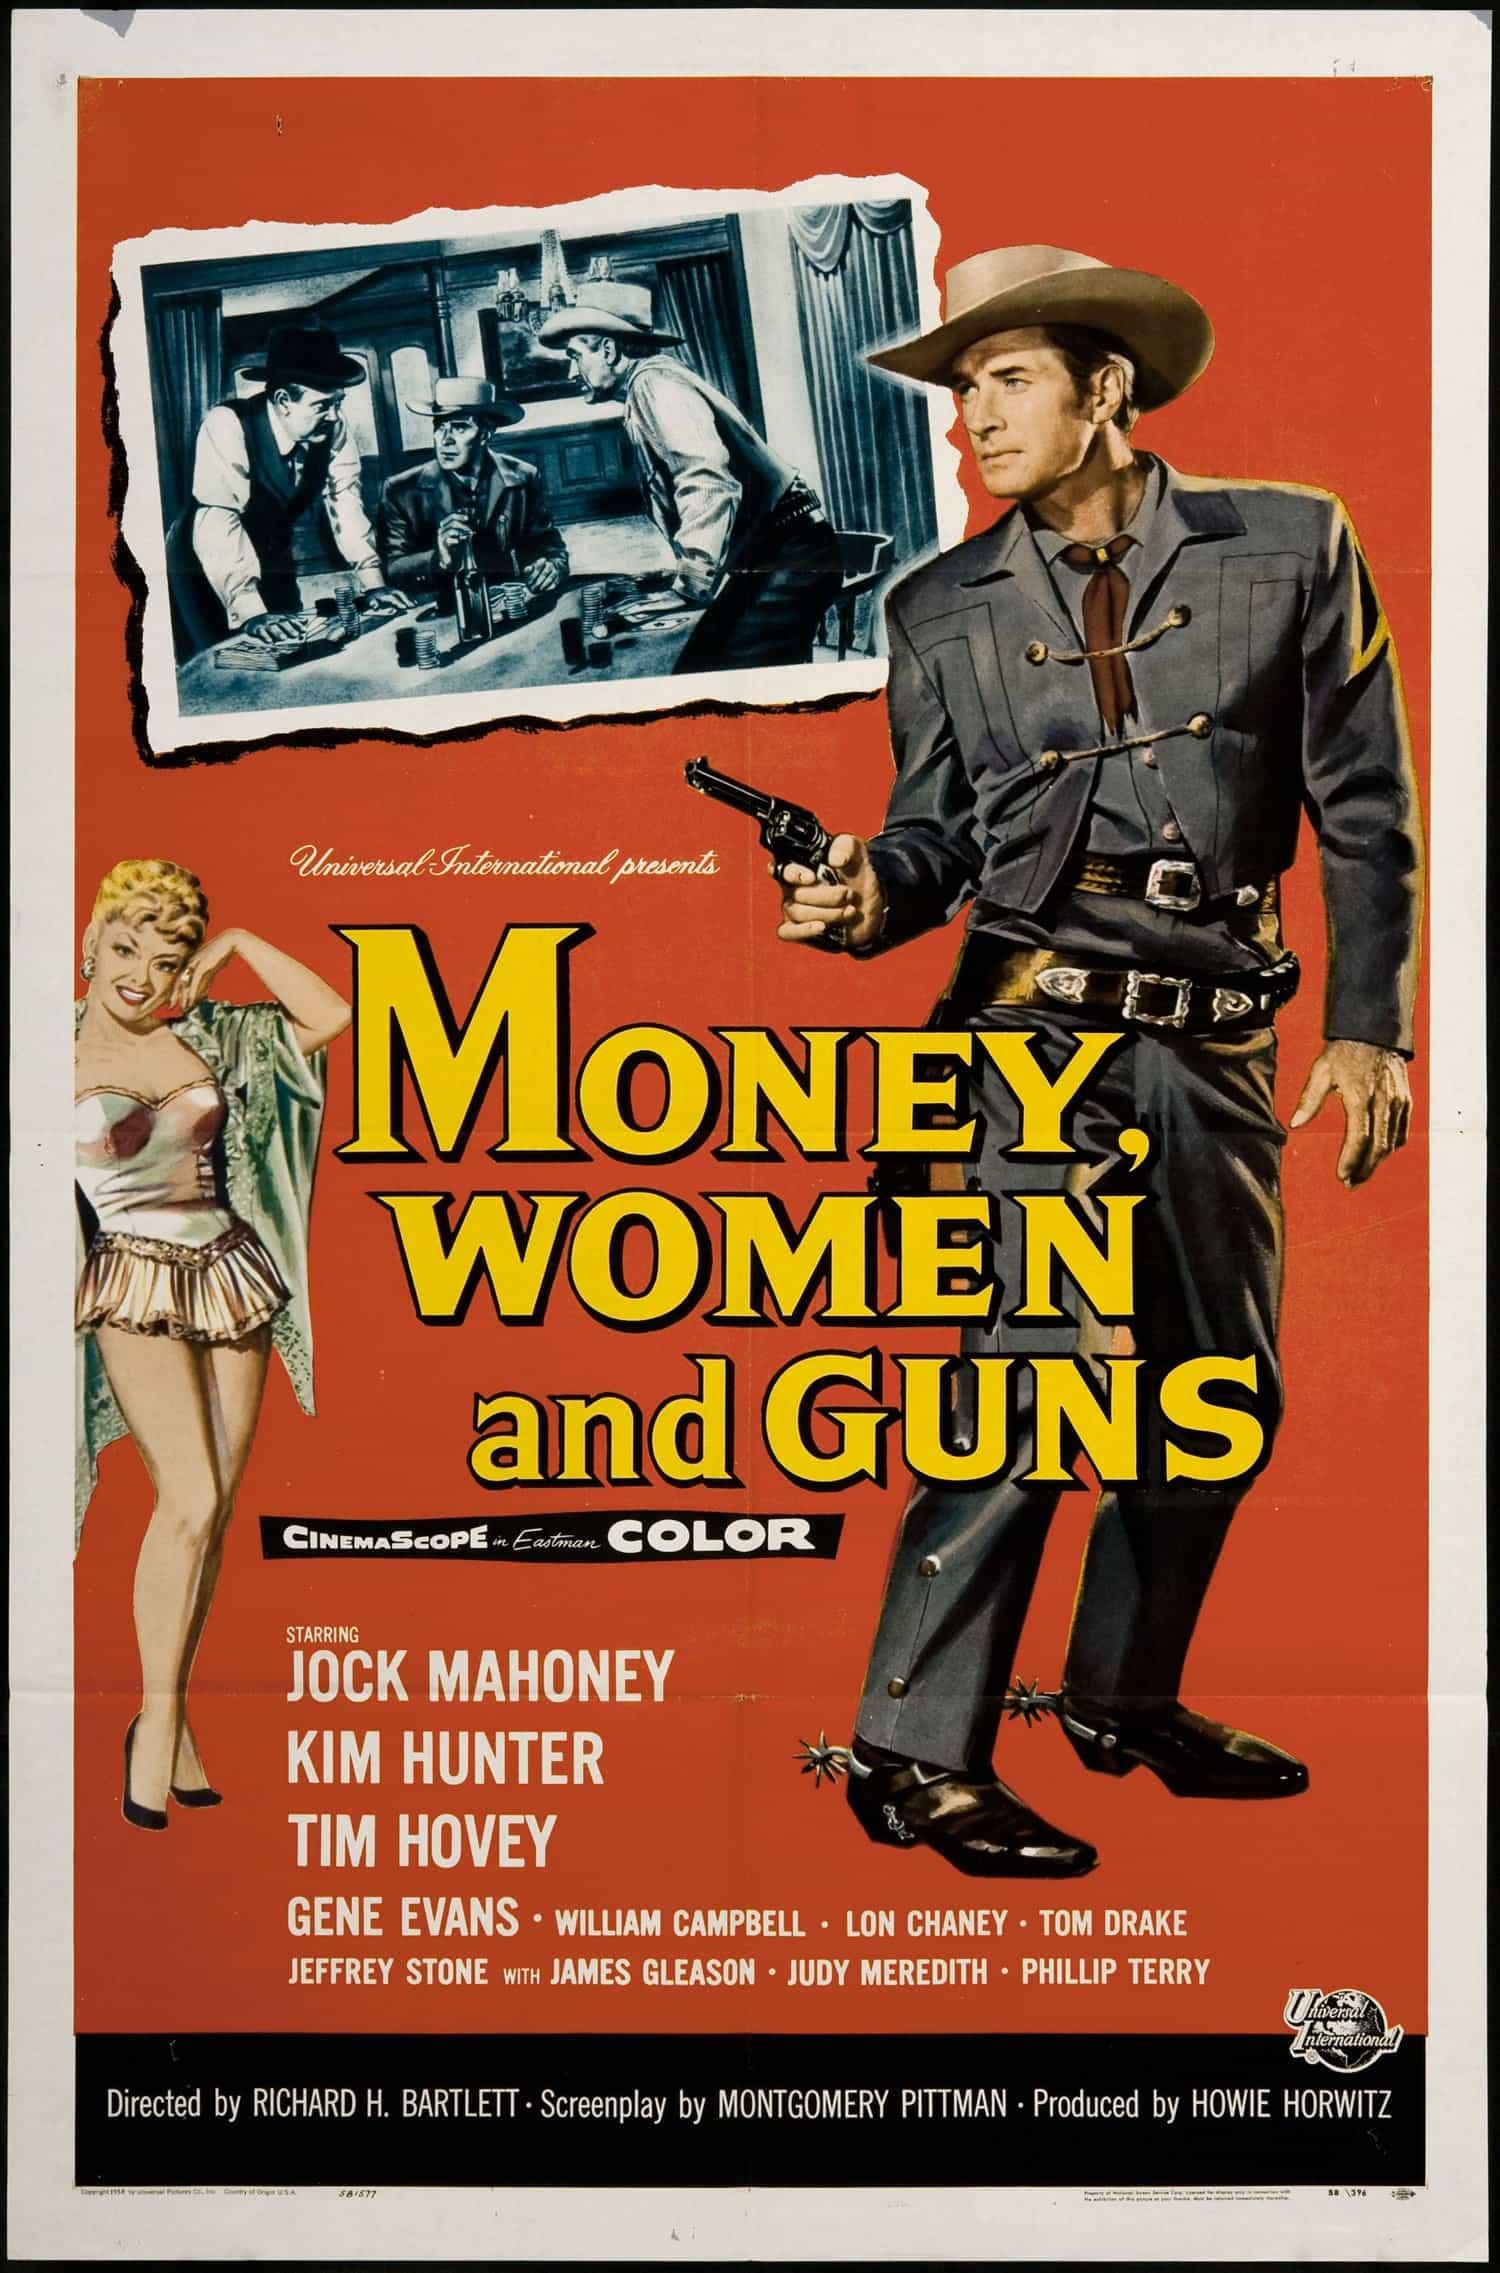 retro movie poster art money women and guns richard h